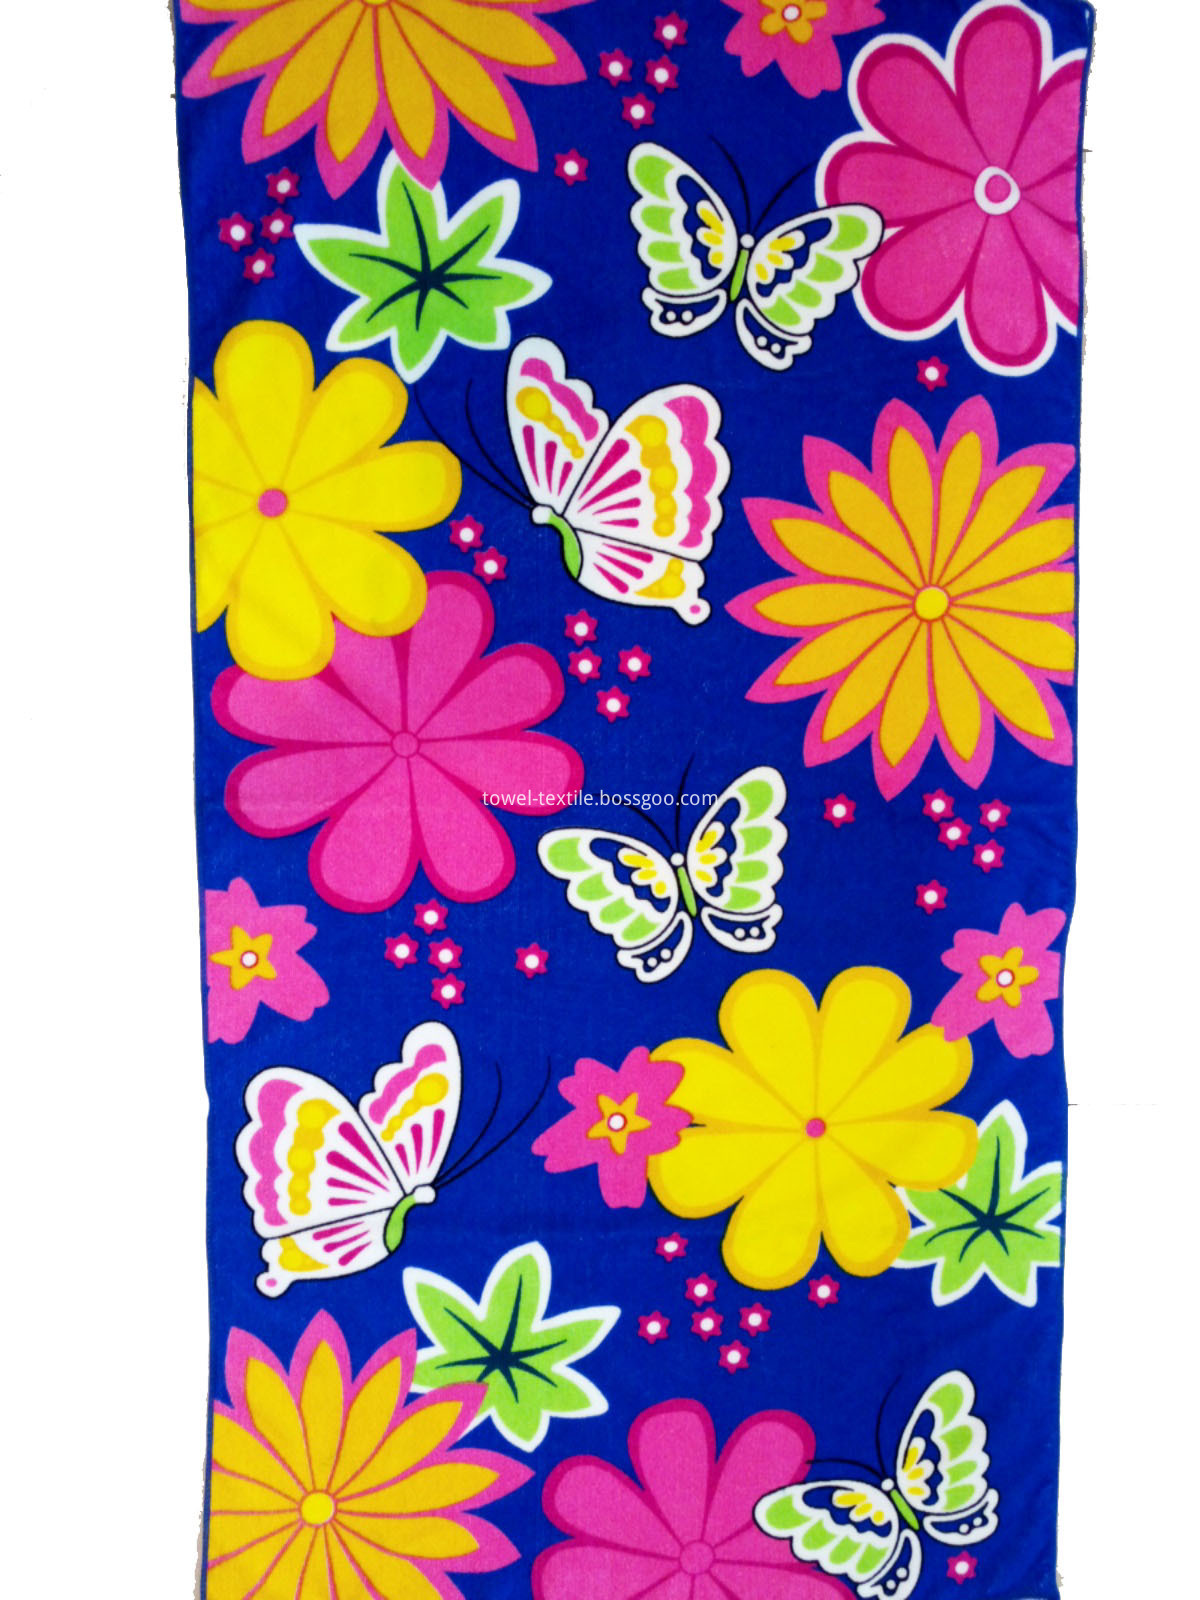 Floral Microfiber Towels